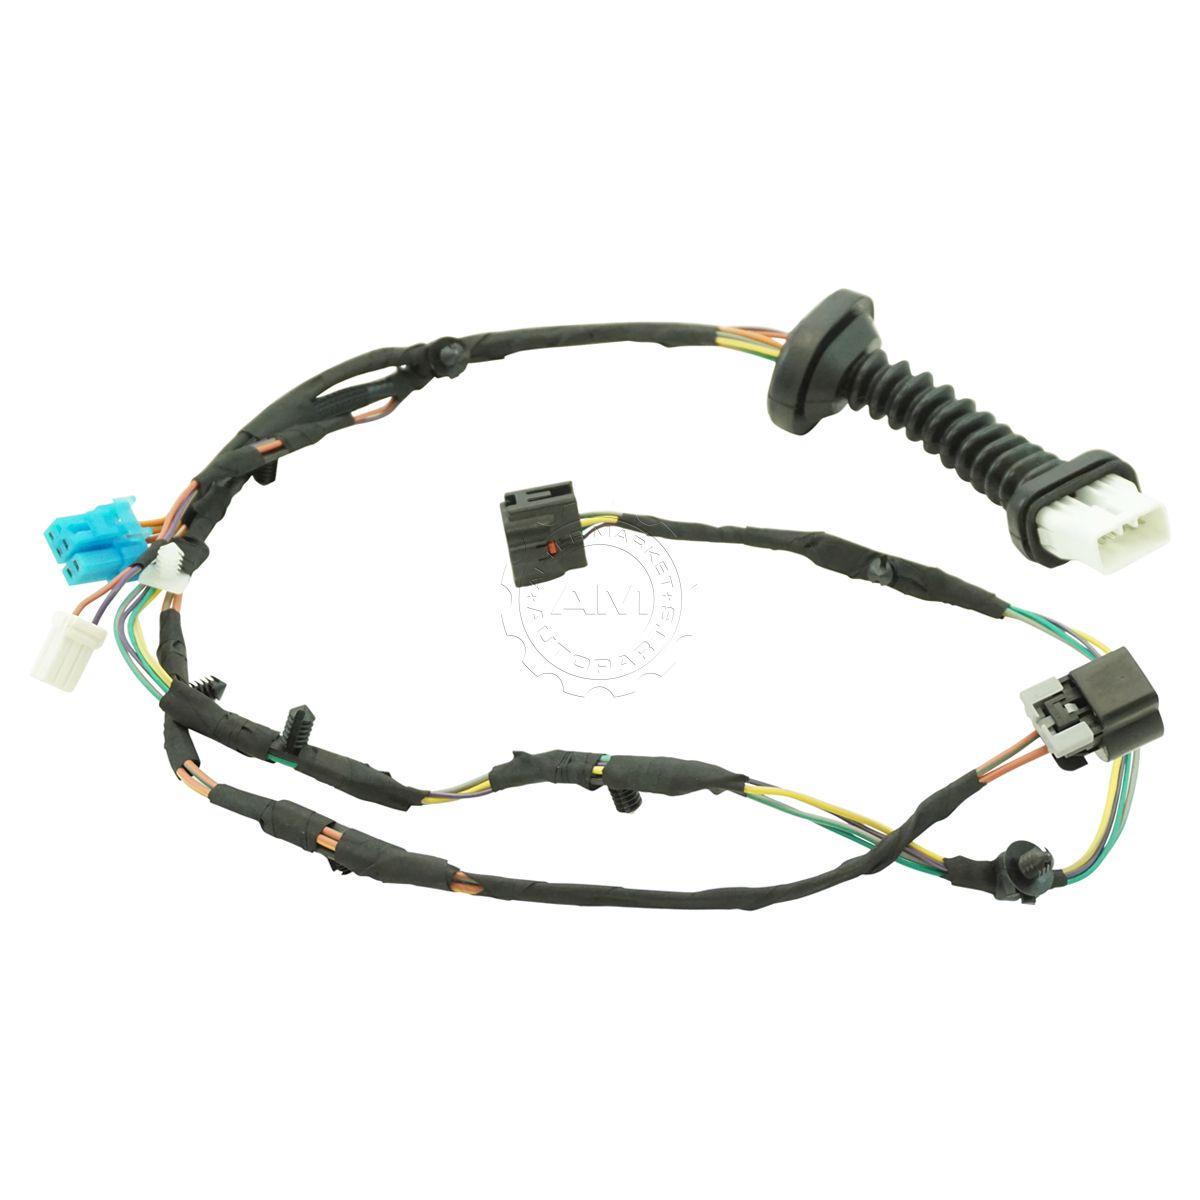 hight resolution of dorman 645 506 rear door wiring harness for 04 05 dodge ram pickup truck